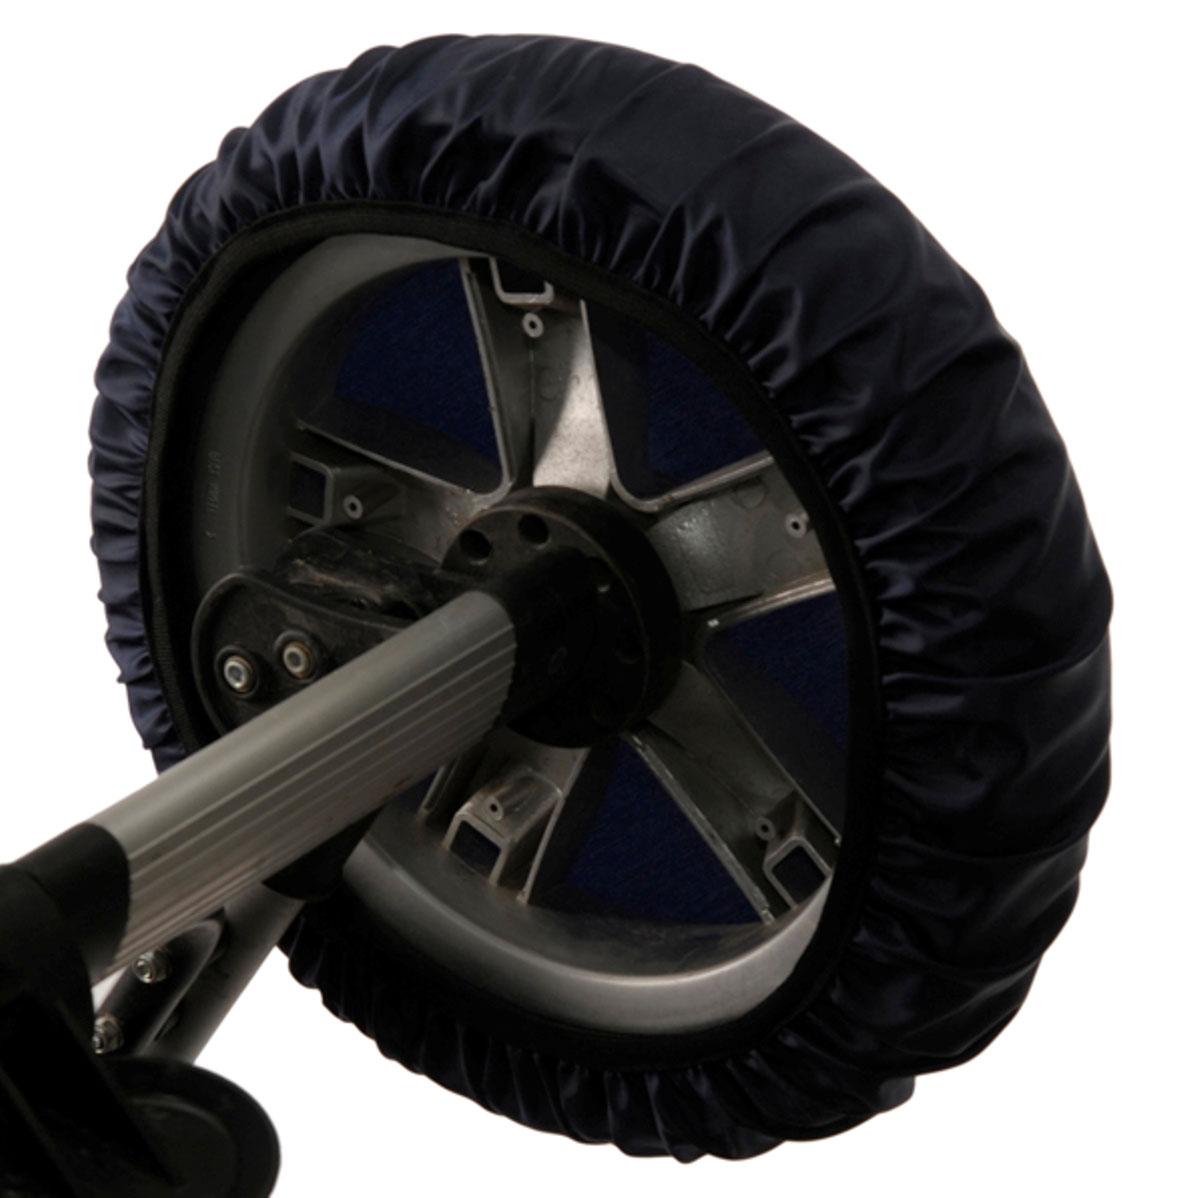 Чудо-Чадо Чехлы на колеса для коляски диаметр 18-28 см цвет темно-синий 2 шт чехлы для рапир москва